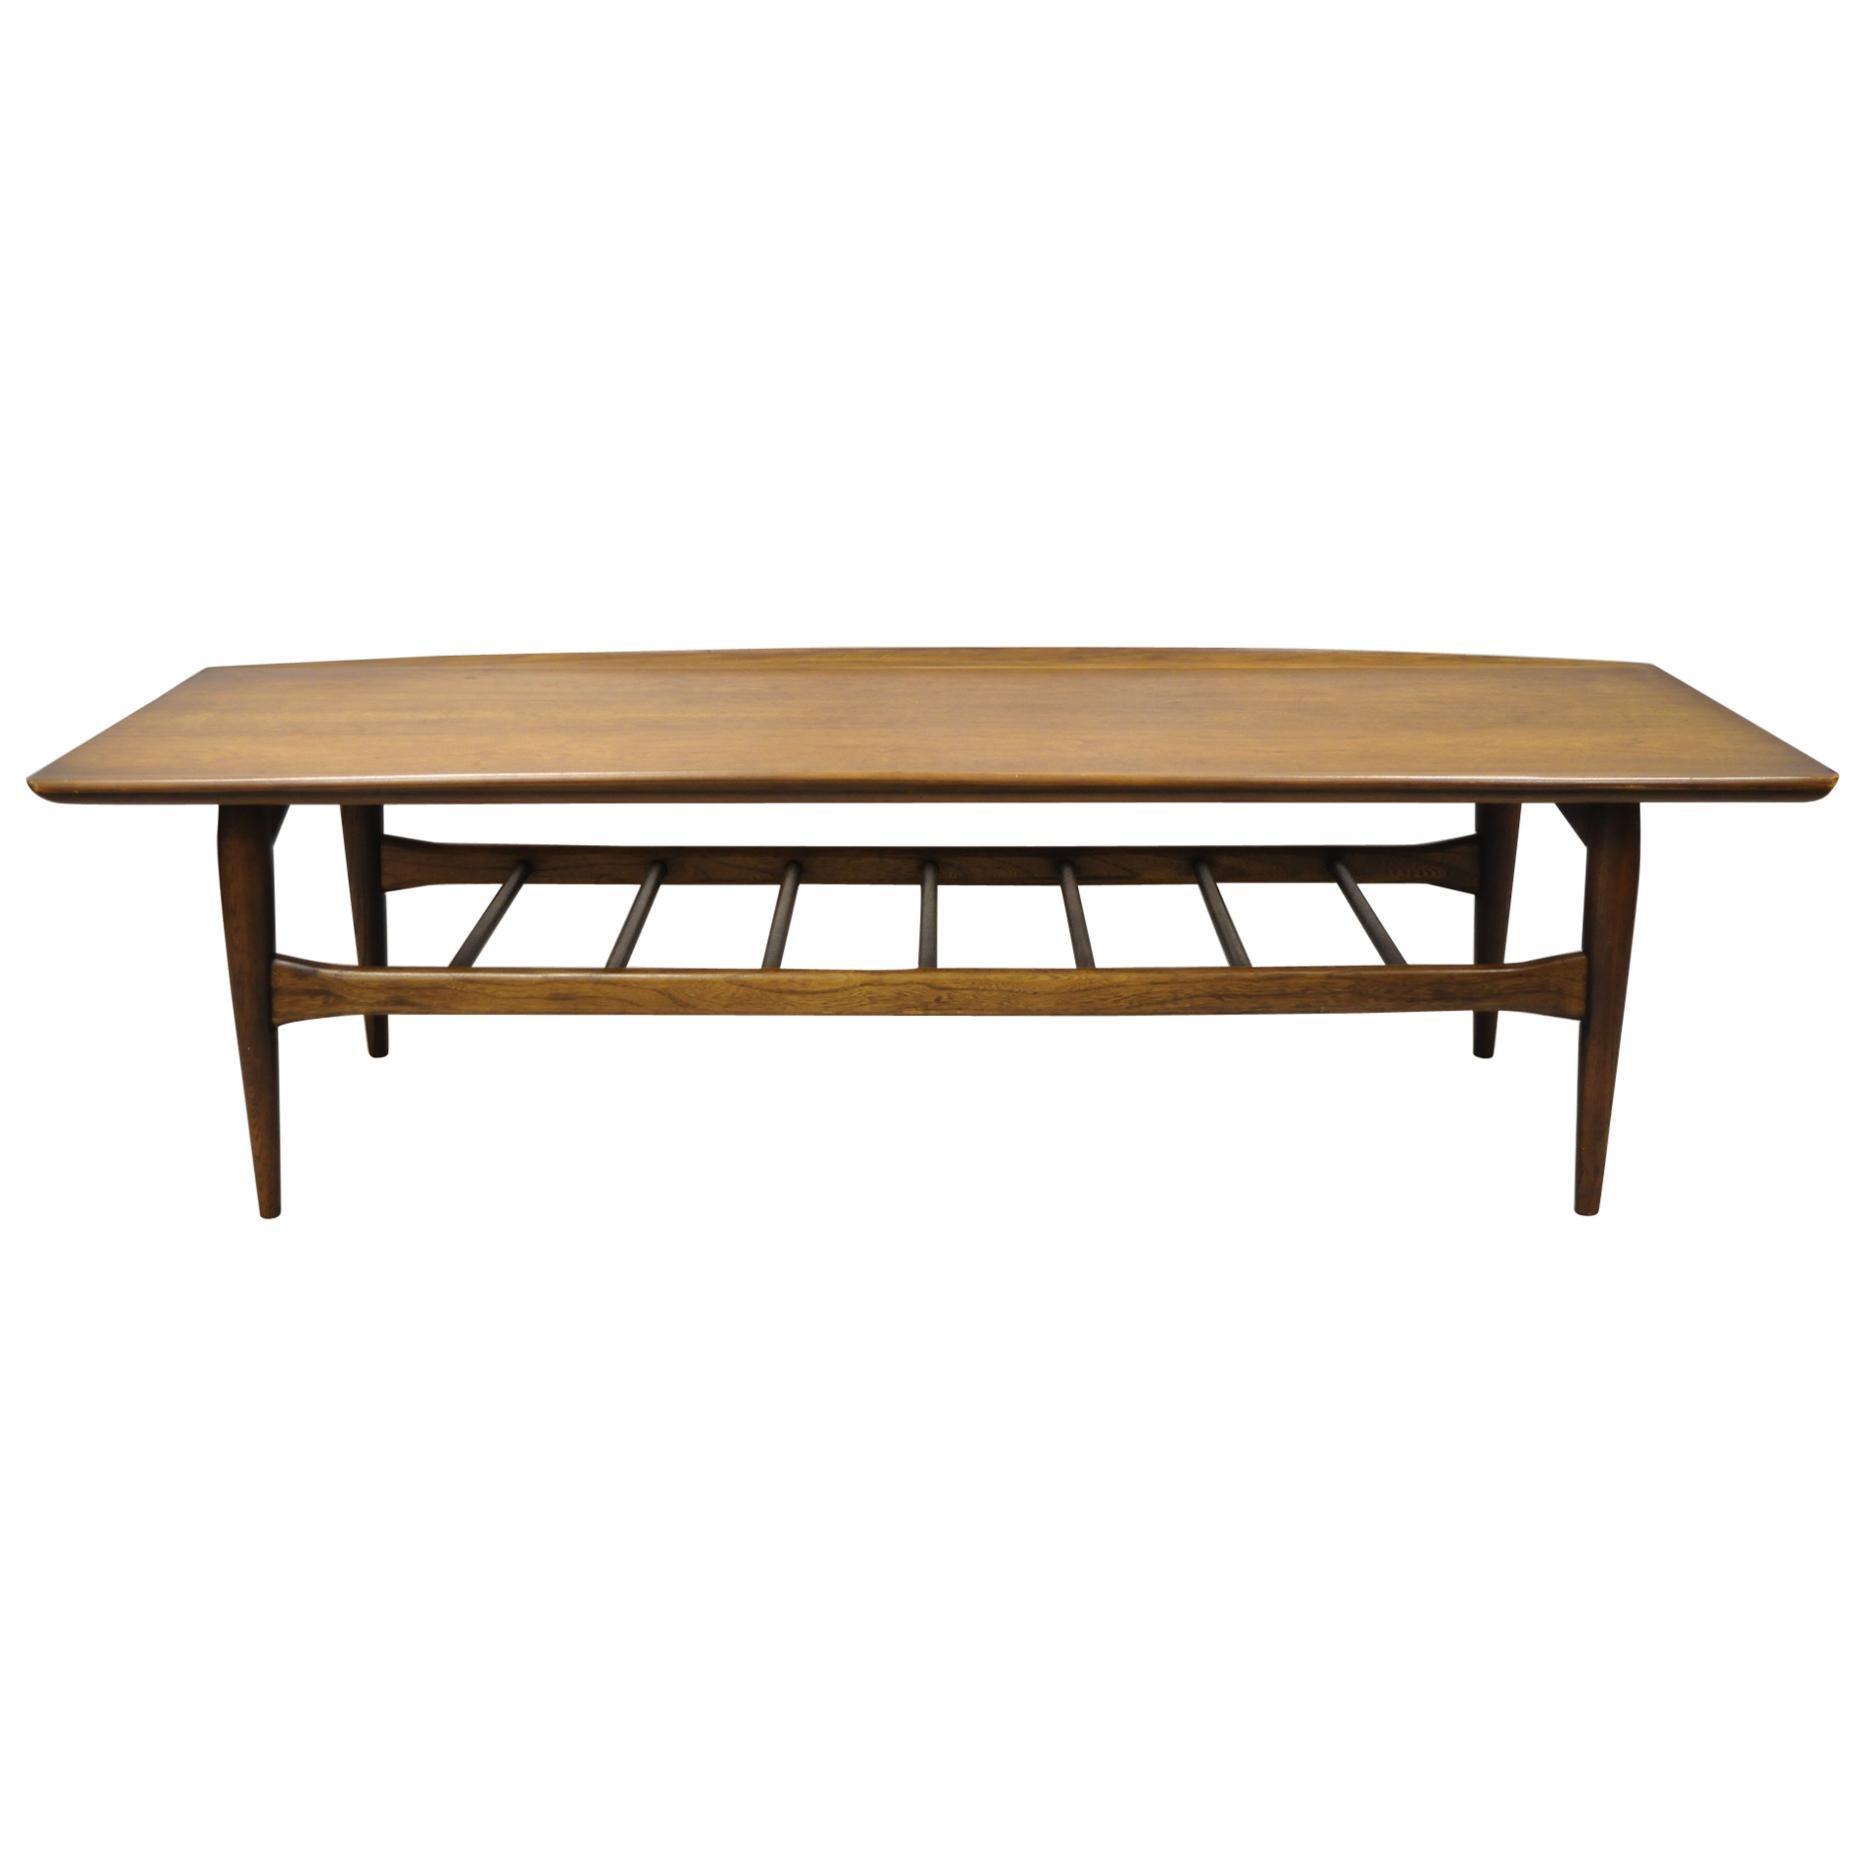 Vintage Mid-Century Modern Bassett Walnut Sculpted Edge Surfboard Coffee Table